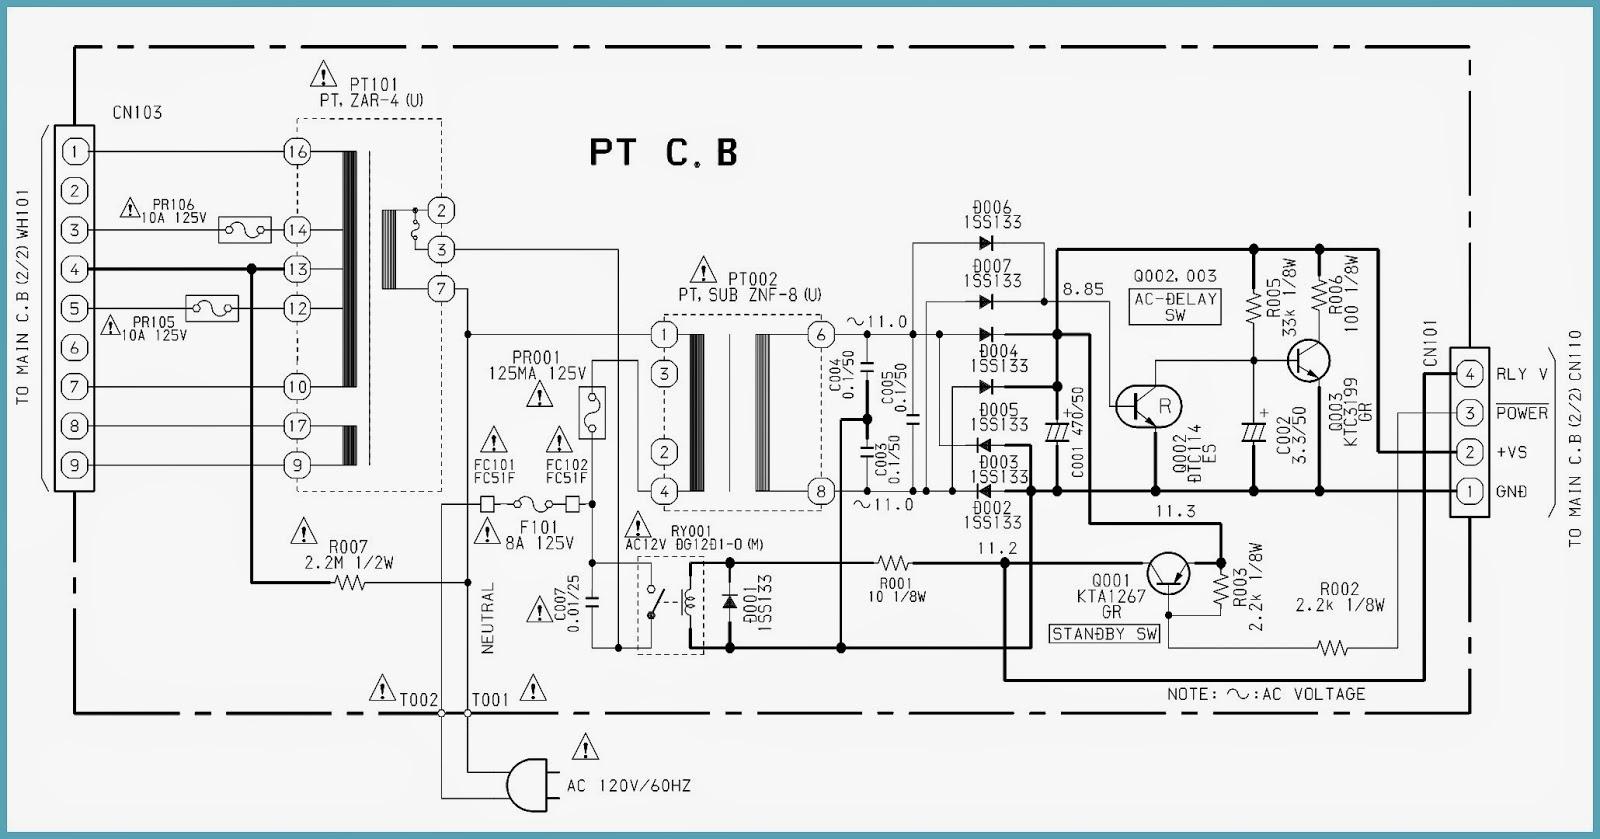 [DIAGRAM_0HG]  KB_1241] Aiwa Stereo Wiring Diagram Free Diagram | Aiwa Wiring Diagram |  | Atrix Winn Xortanet Salv Mohammedshrine Librar Wiring 101